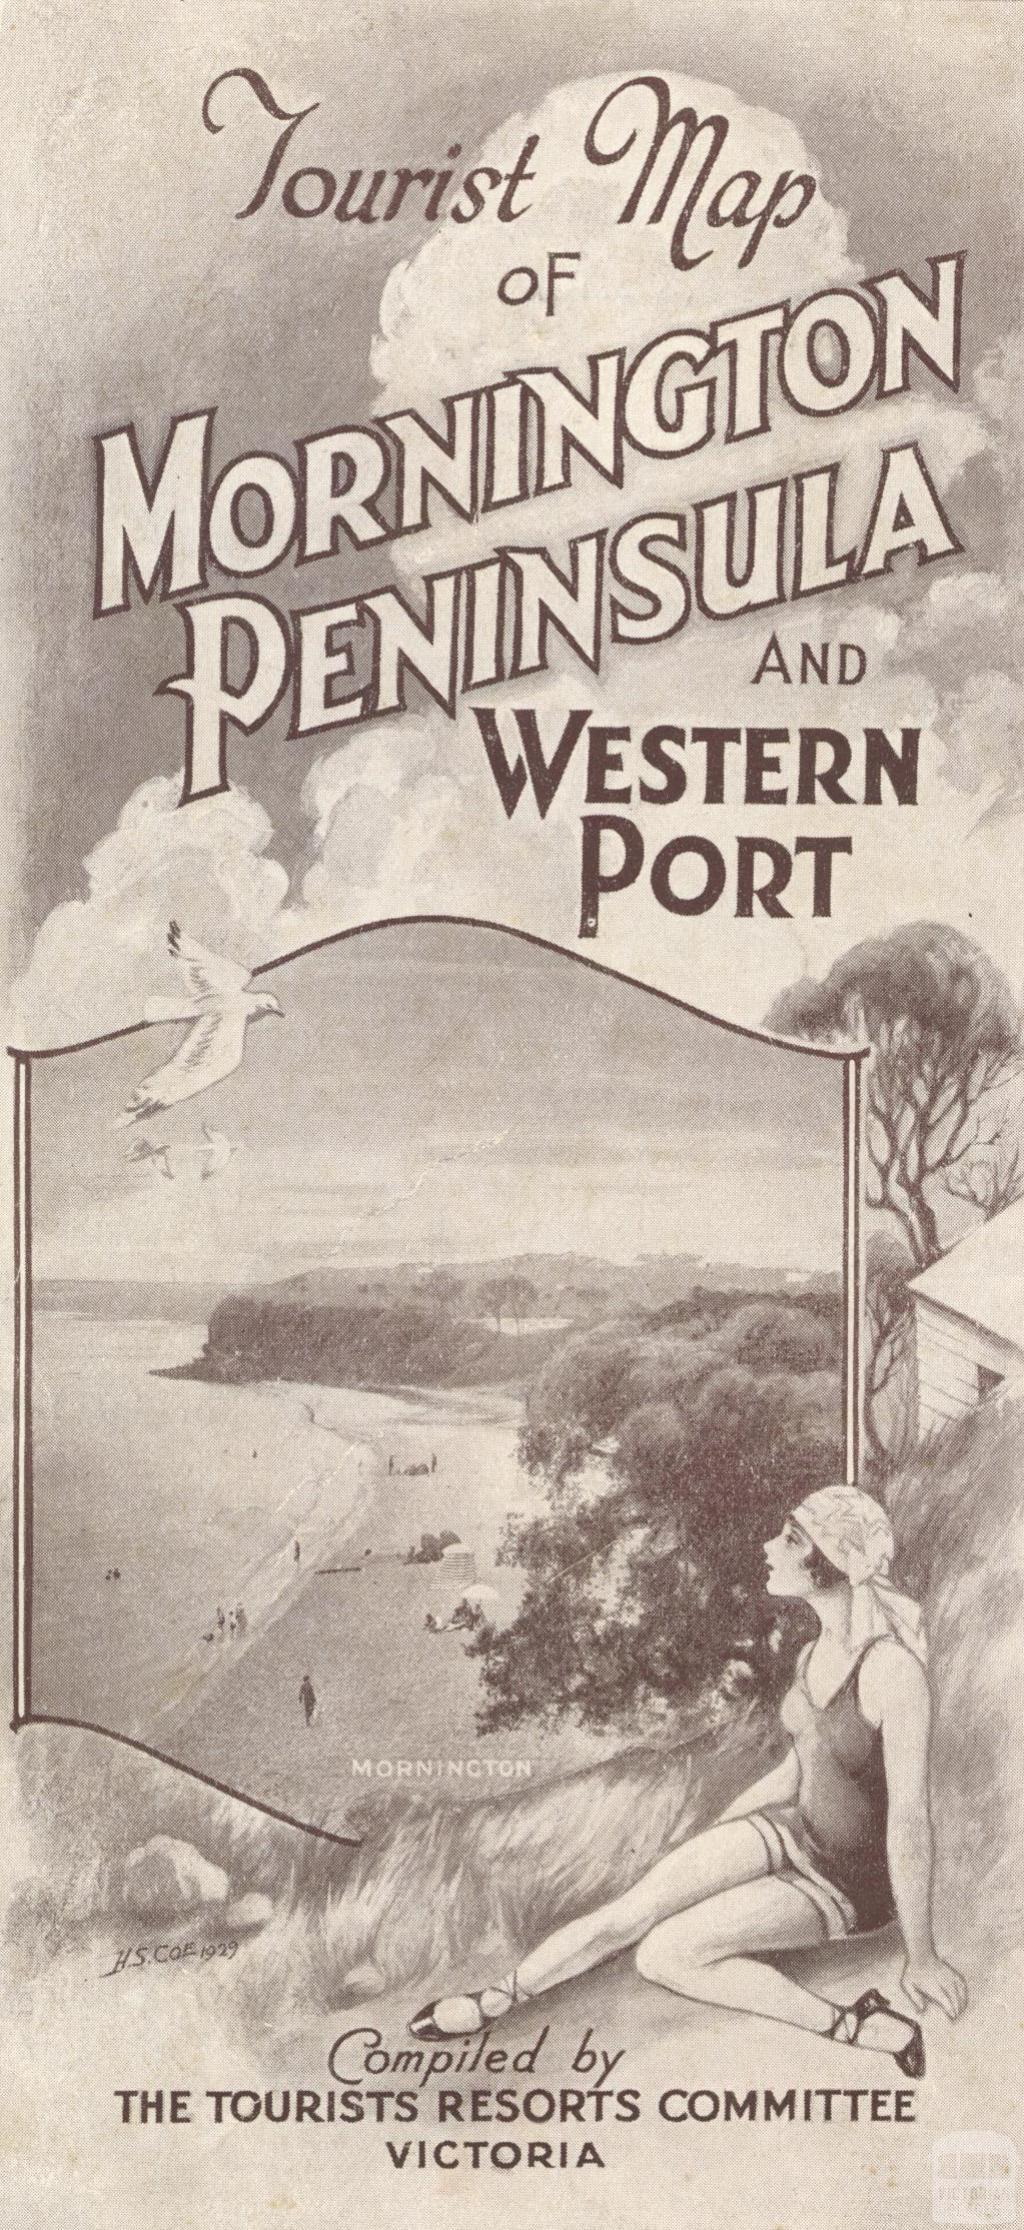 Tourist Map of Mornington Peninsula and Western Port, 1929